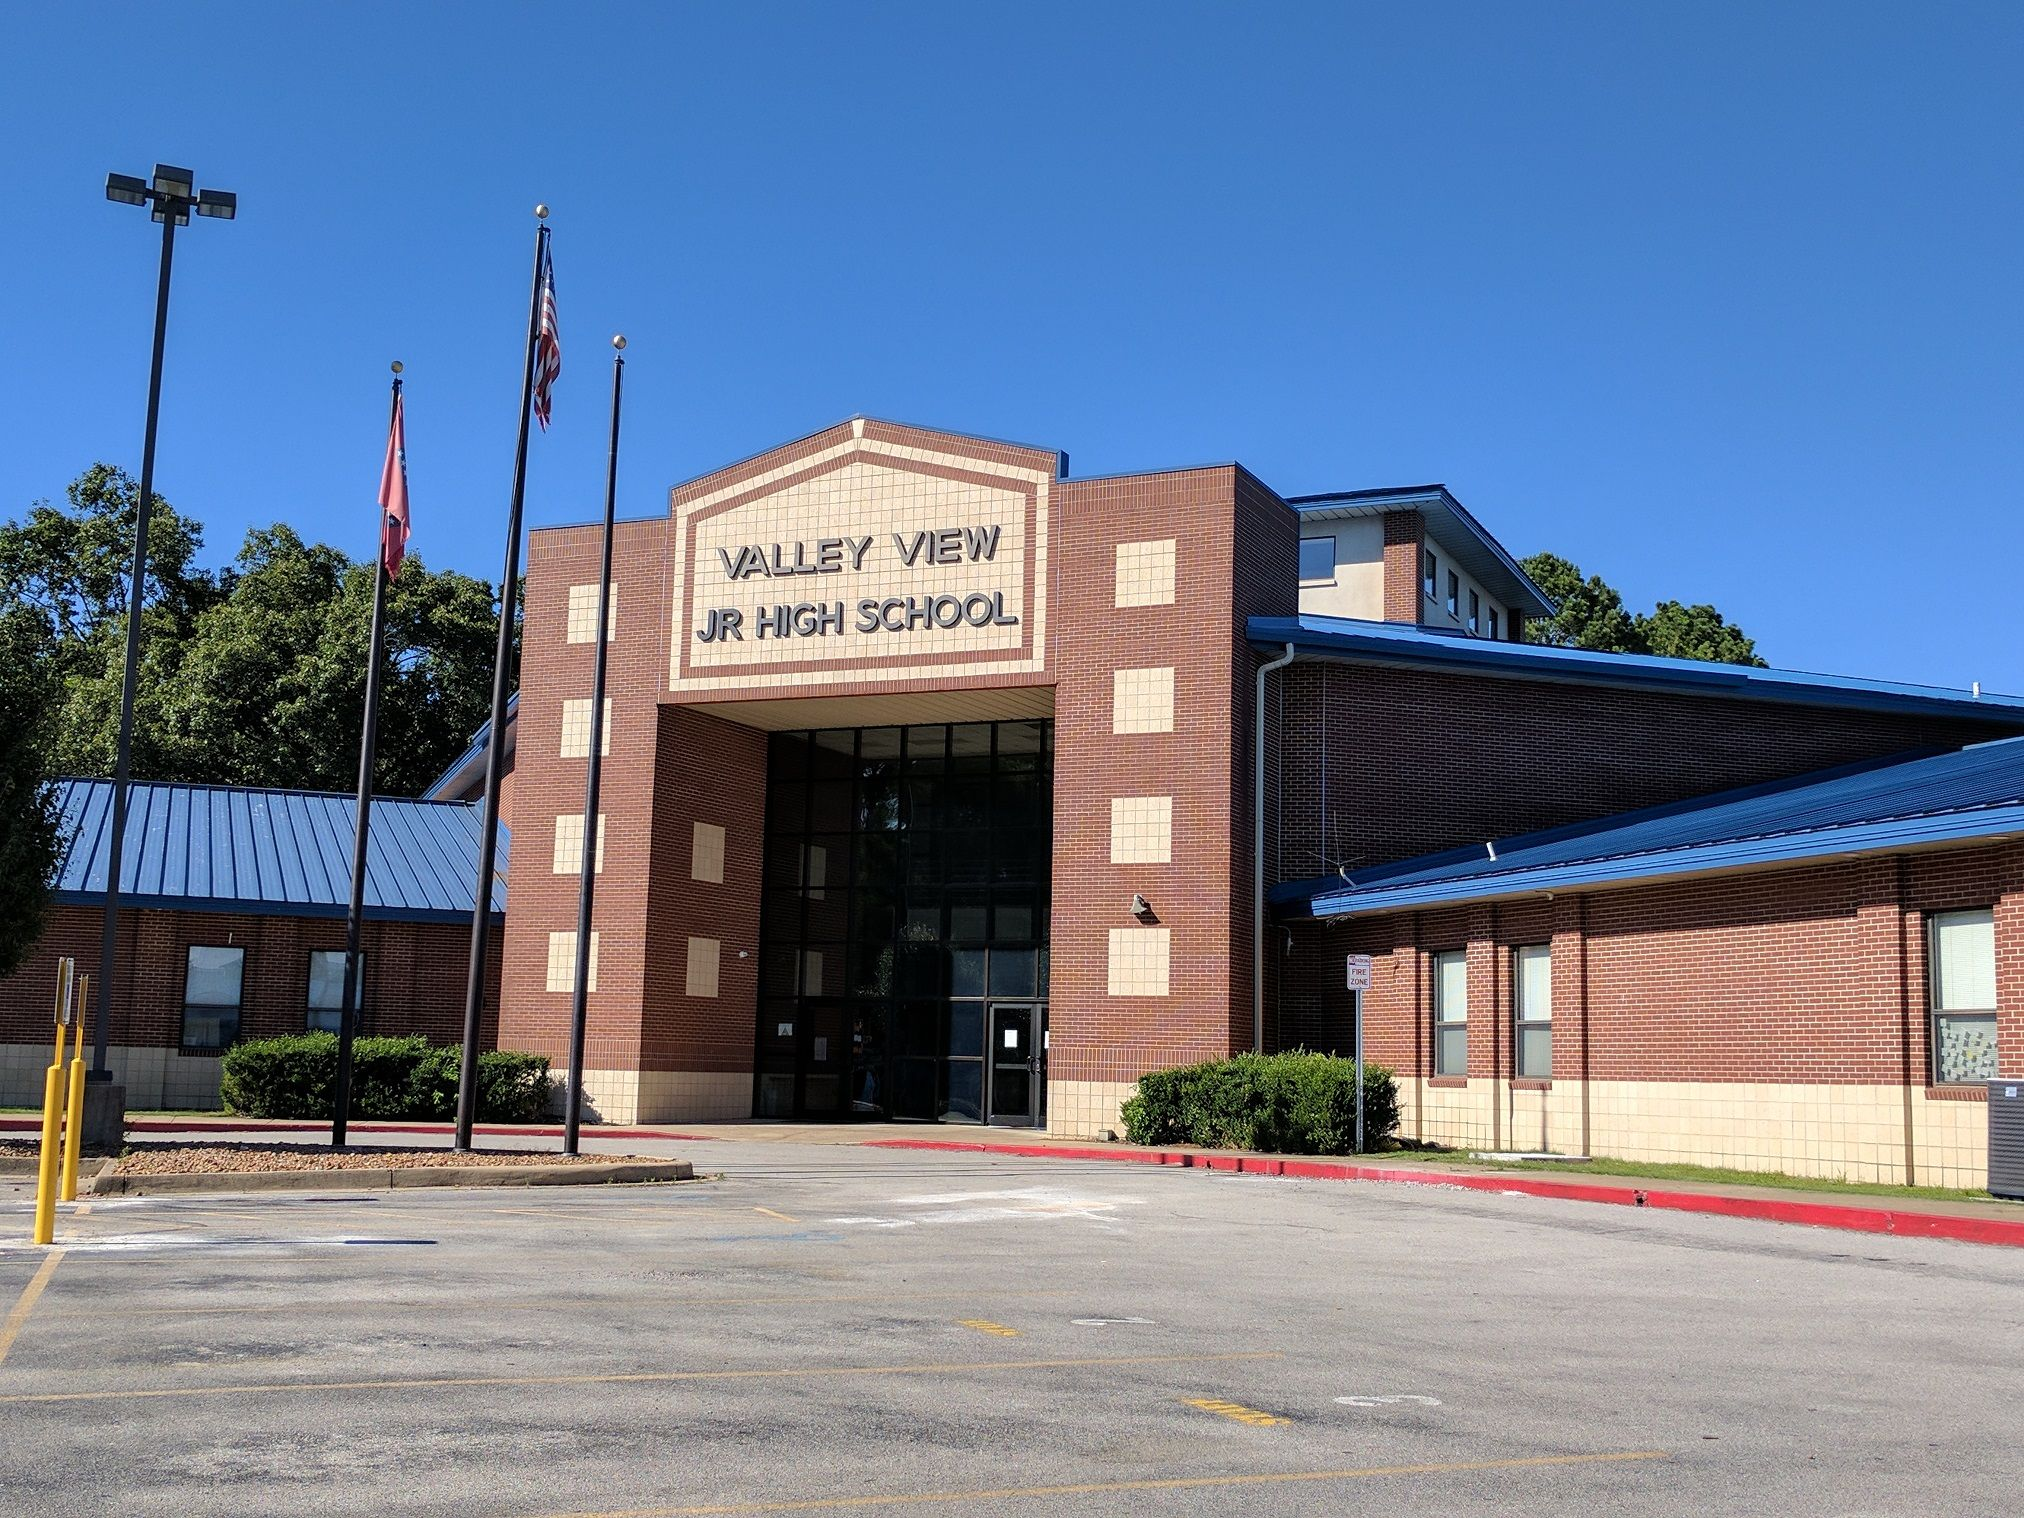 Image Result For Valley View Junior High School Jonesboro Ar